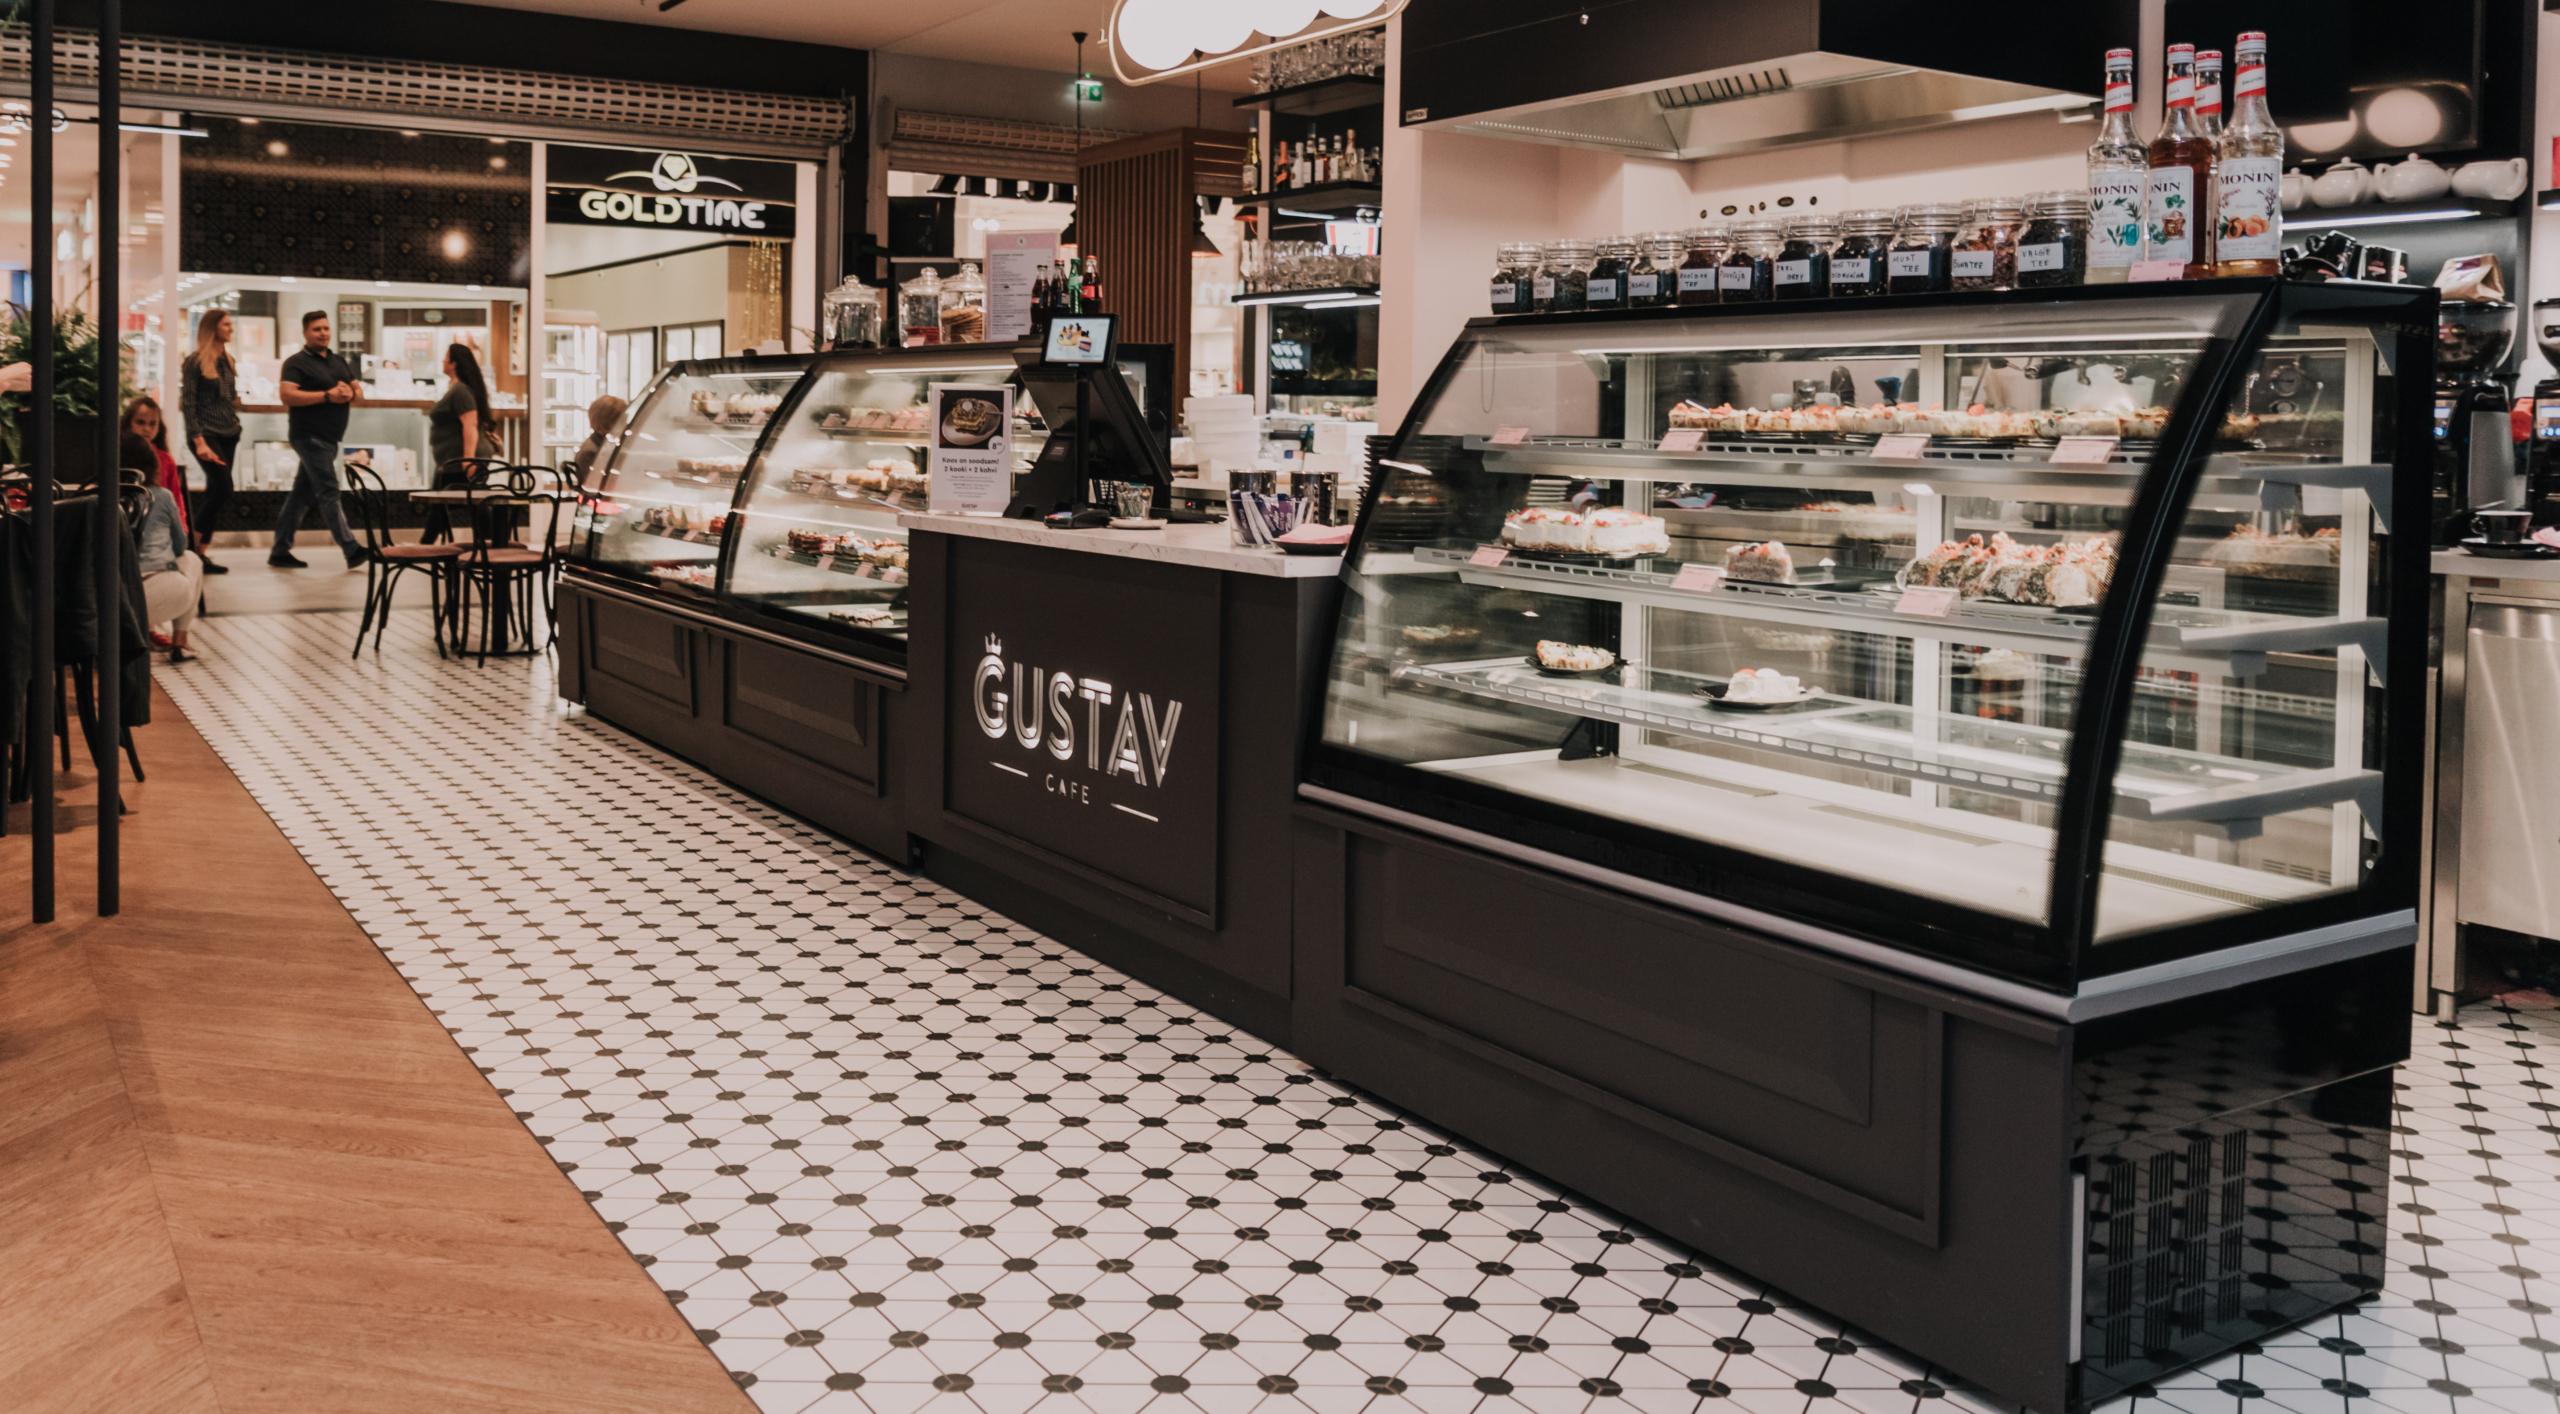 Gustav Cafe Kristiine